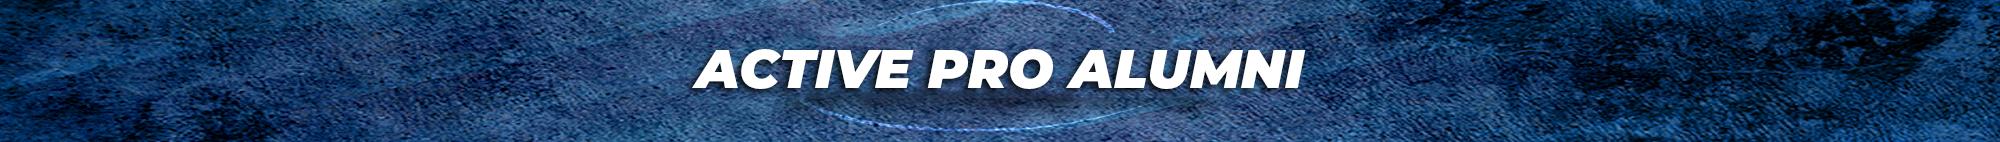 Active-Pro-Alumni